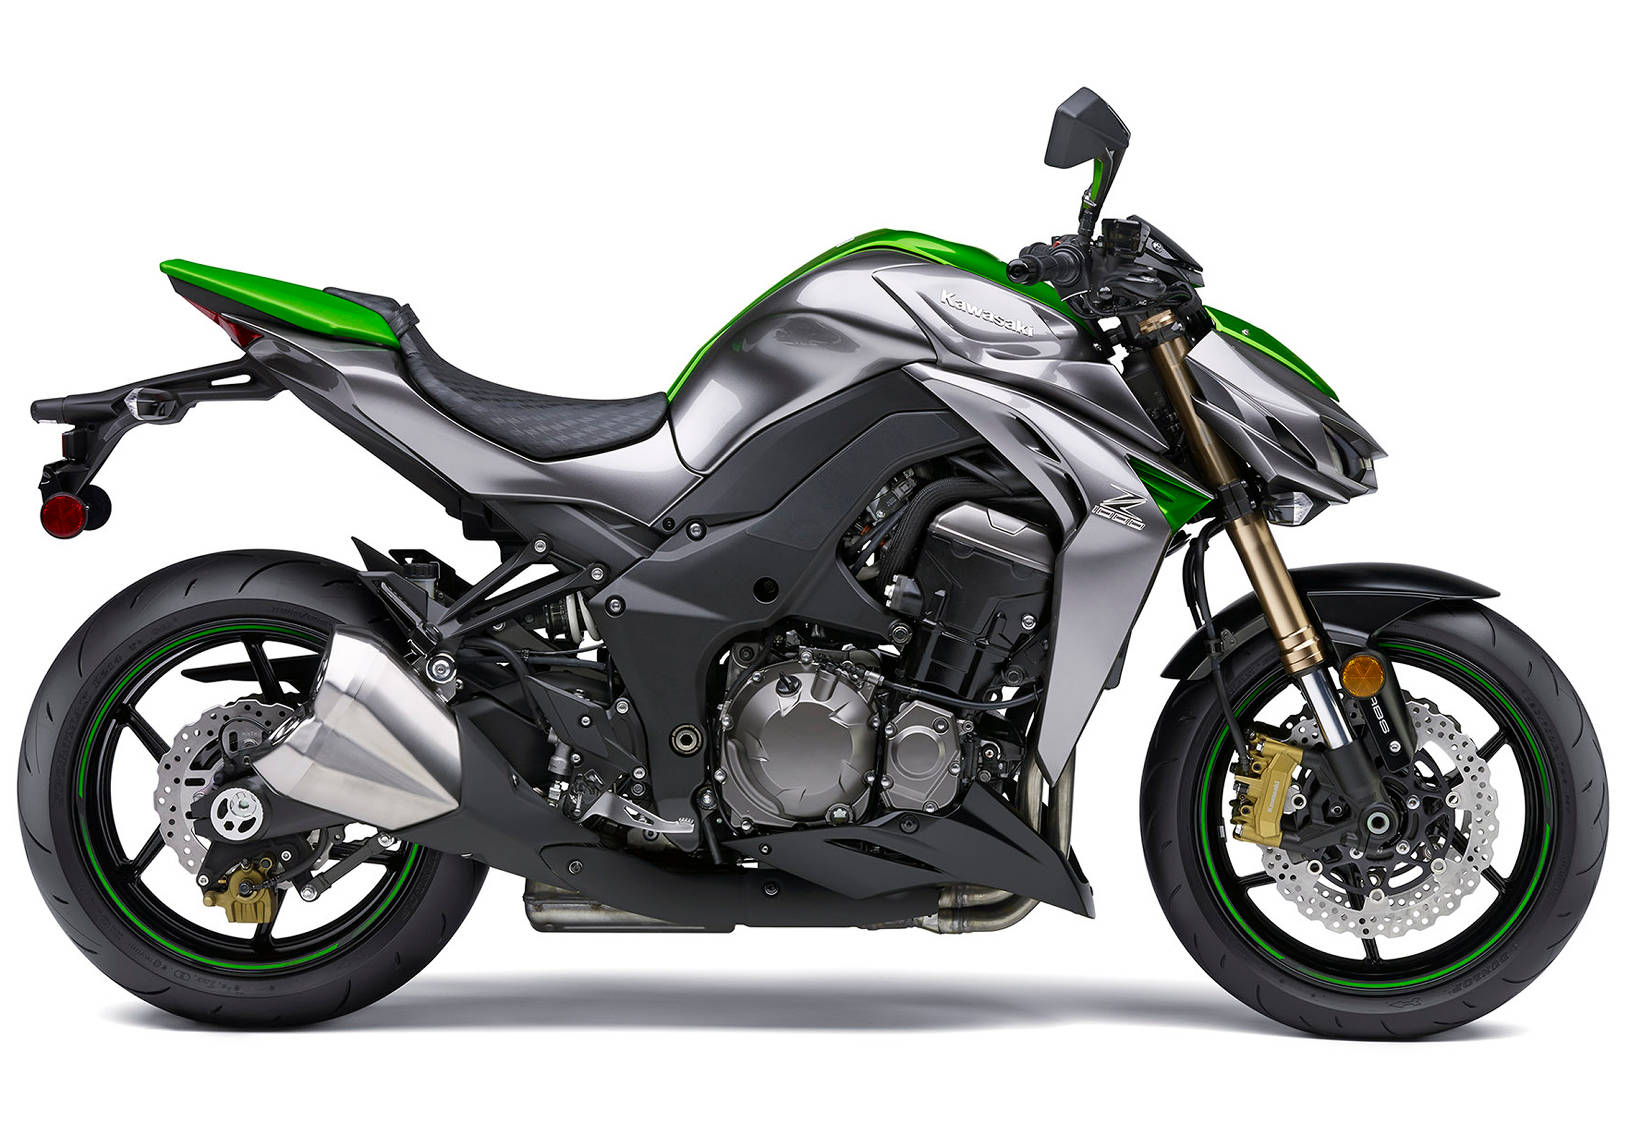 2014 Kawasaki Z1000 ABS review